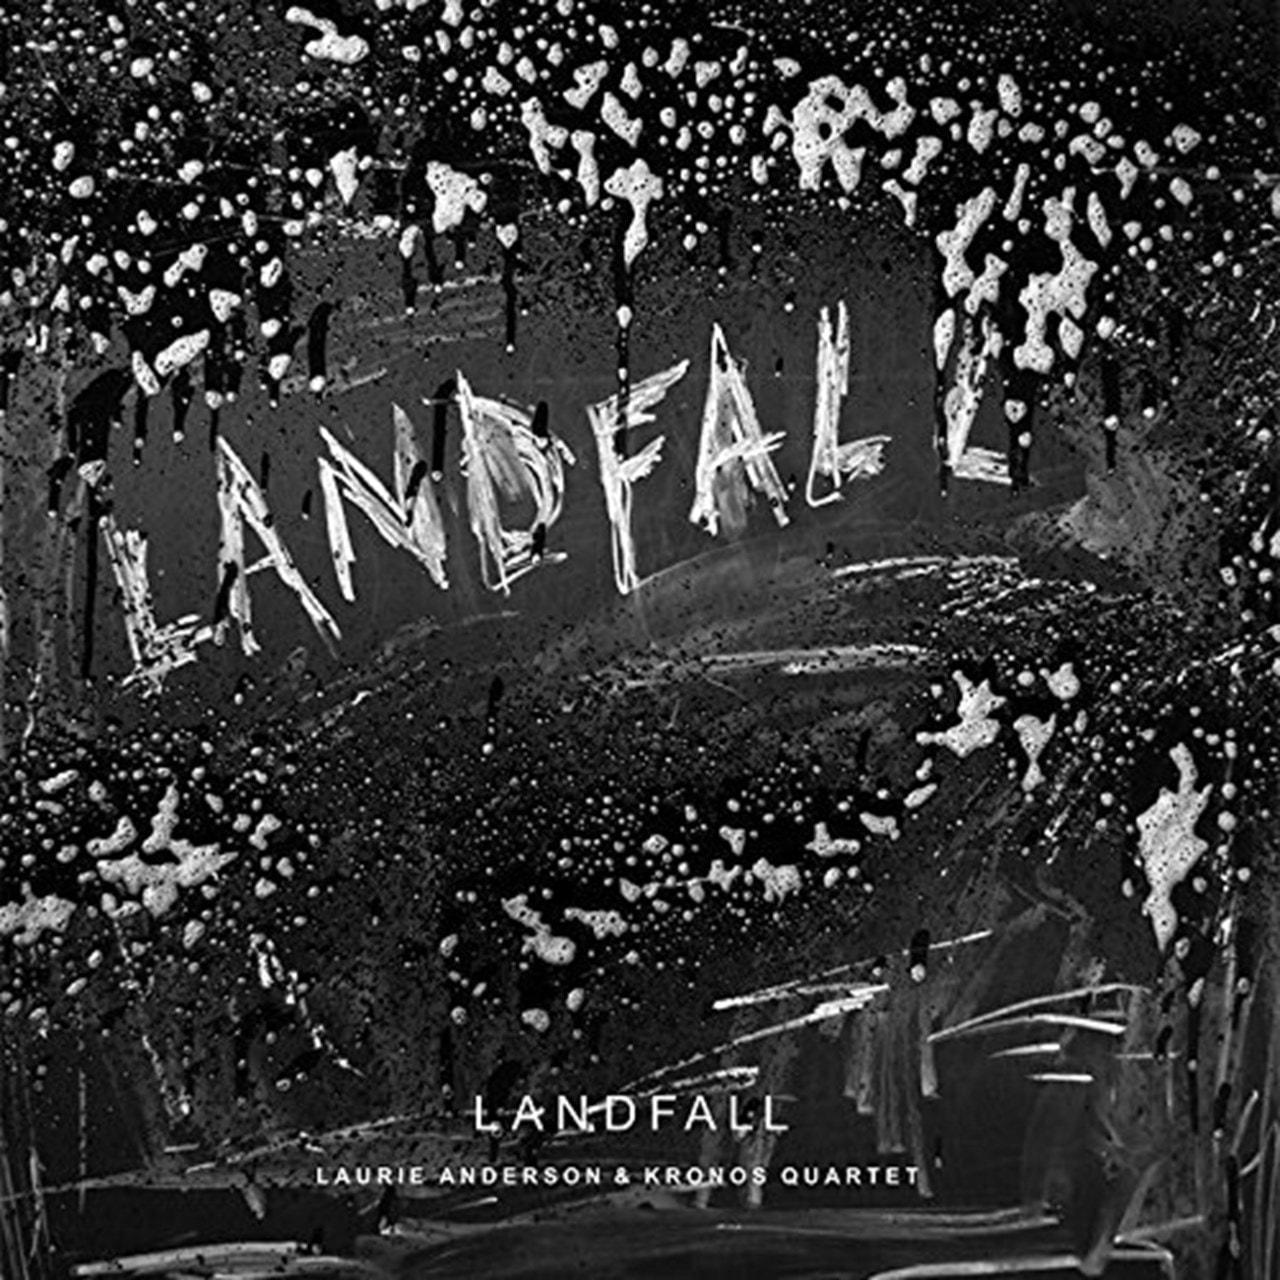 Landfall - 1